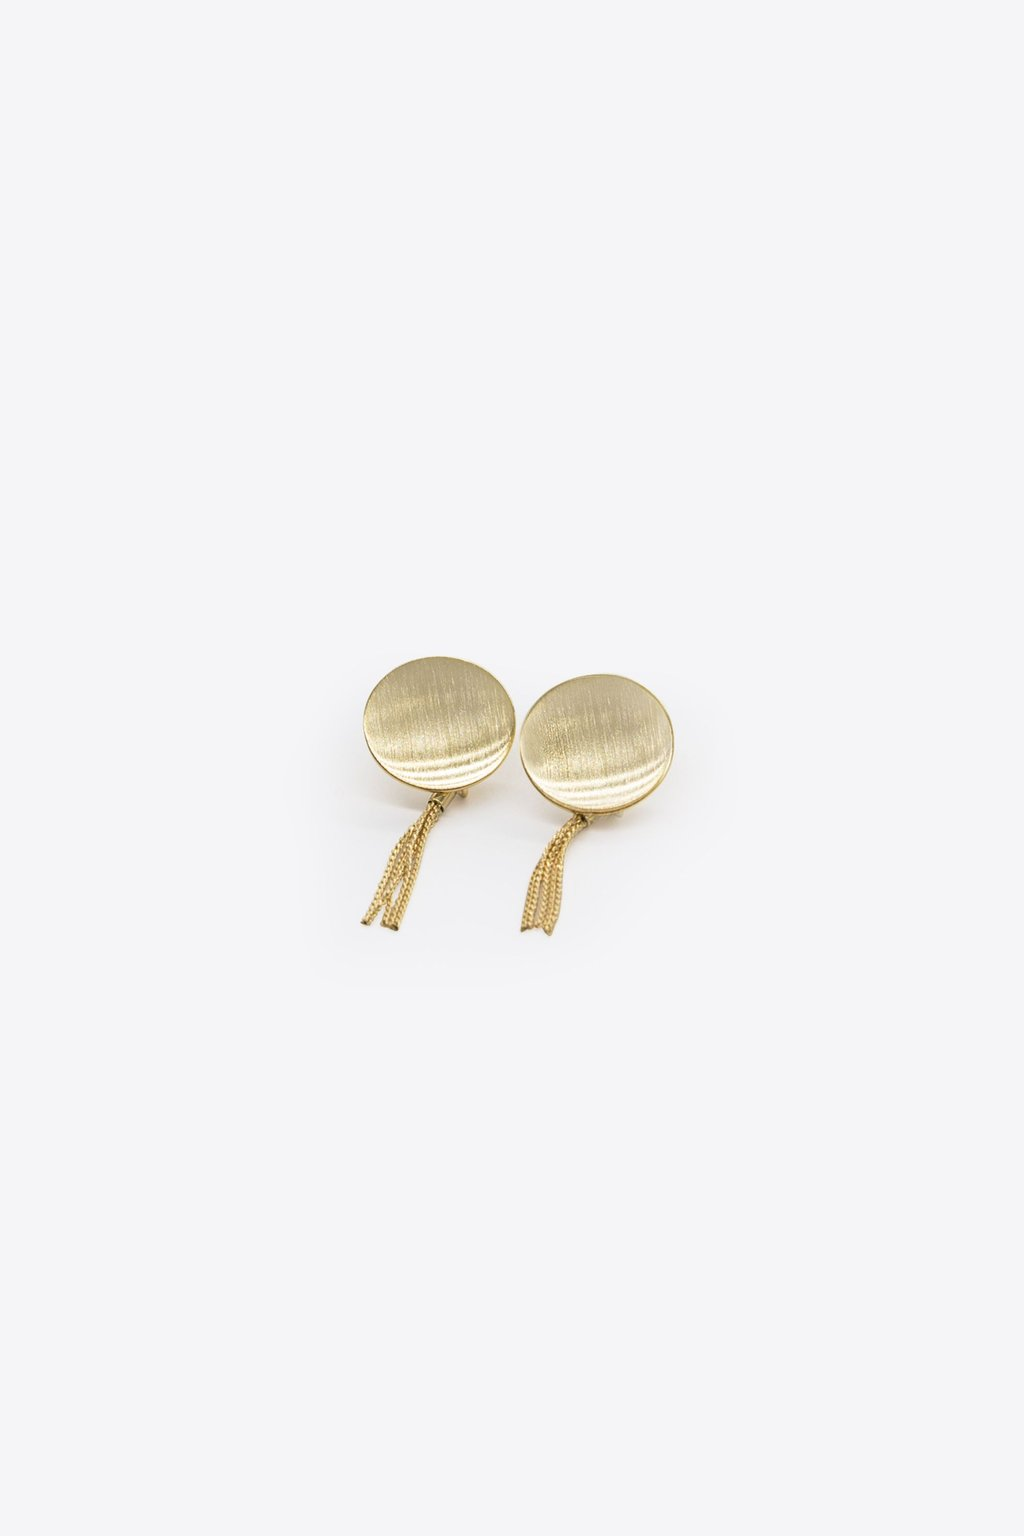 Earring H100 Gold 1